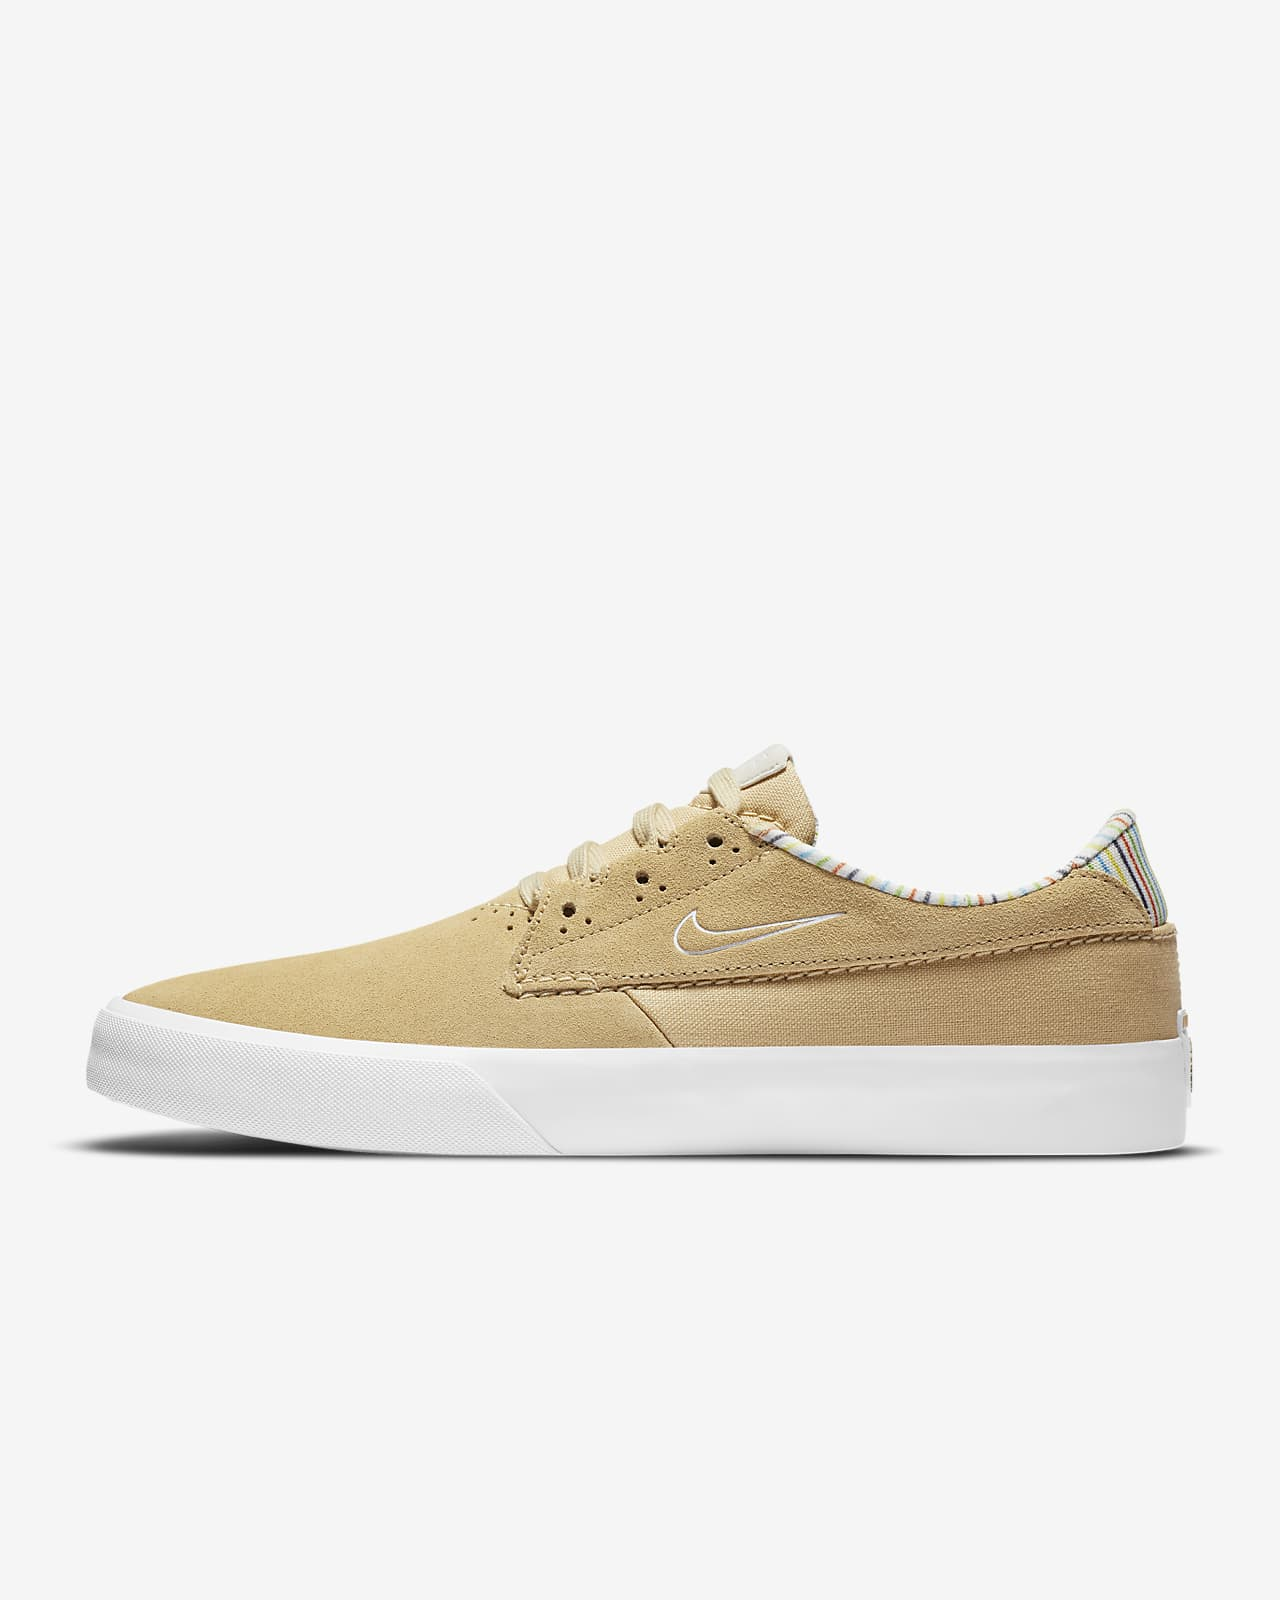 Chaussure de skateboard Nike SB Shane Premium